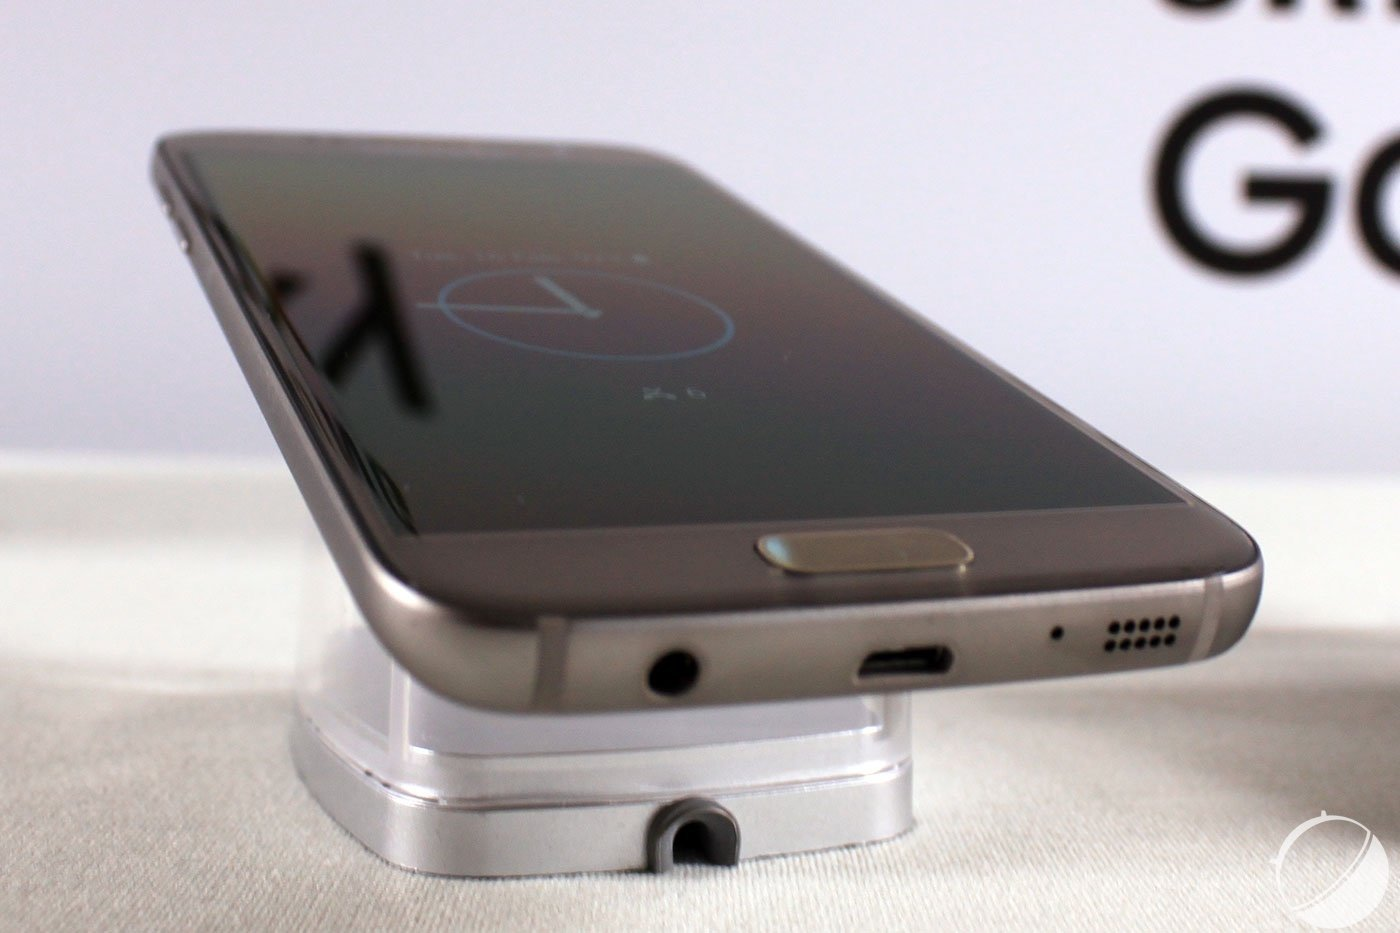 Prise en main du Samsung Galaxy S7 edge, tout d'un grand ?